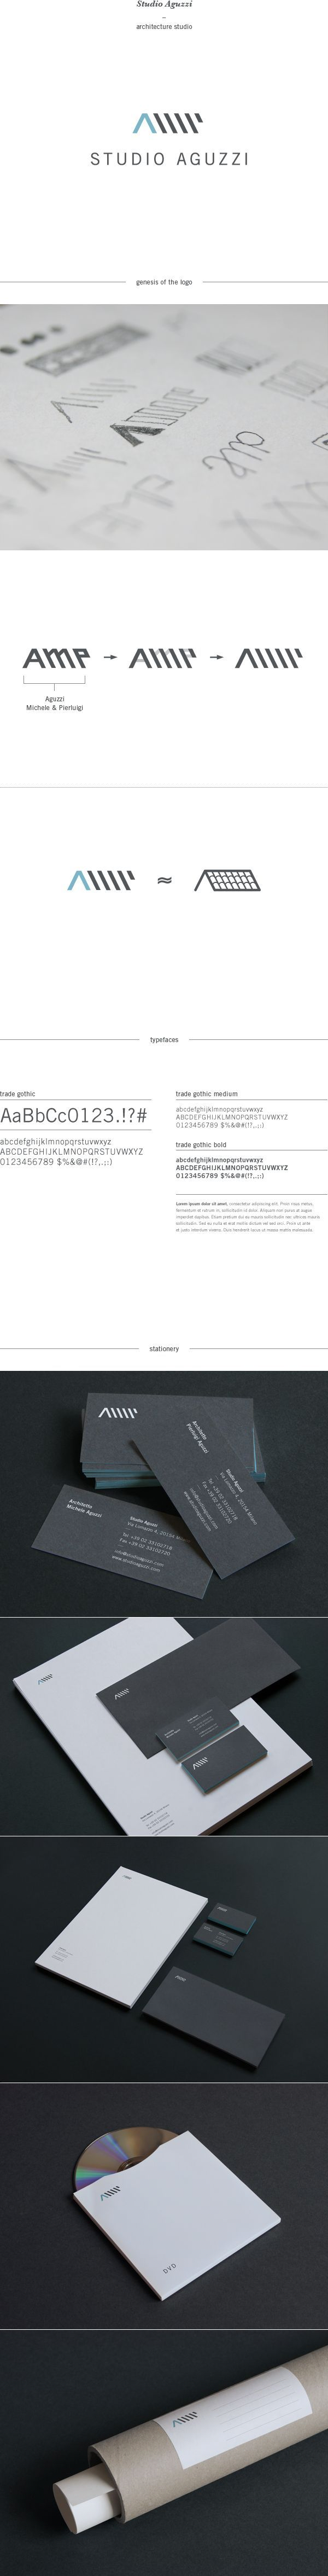 Studio Aguzzi - Architecture Studio by Giorgia Smiraglia, via Behance